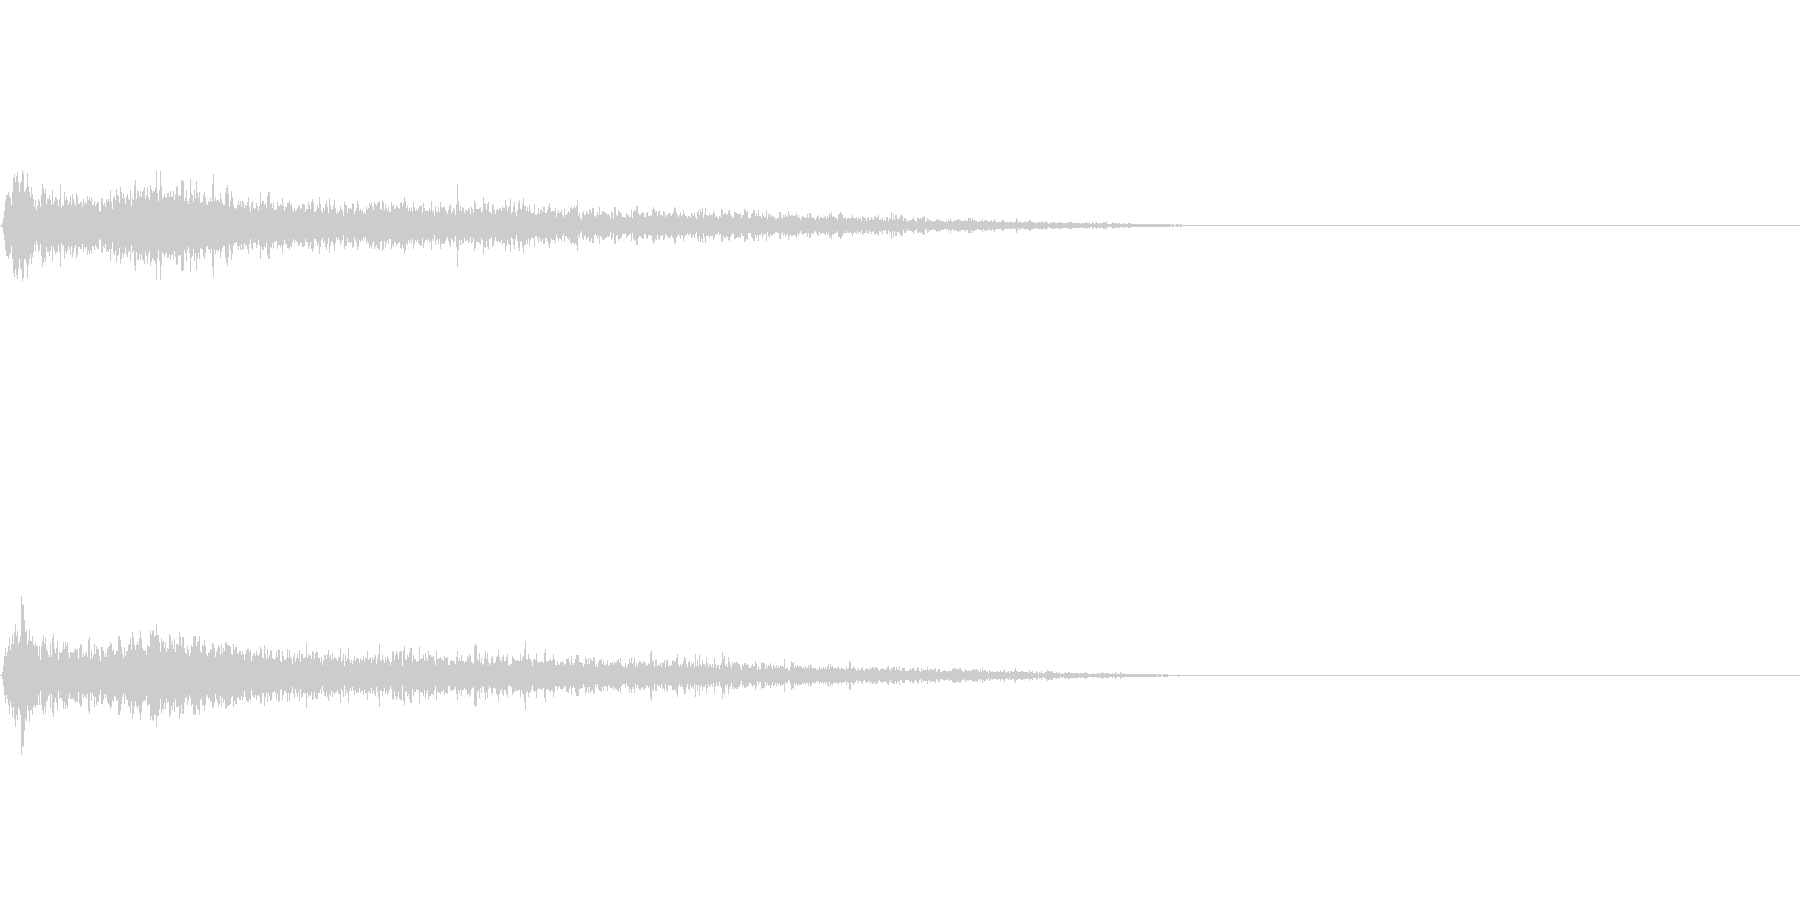 Aメジャー インパクト音 衝撃音の未再生の波形